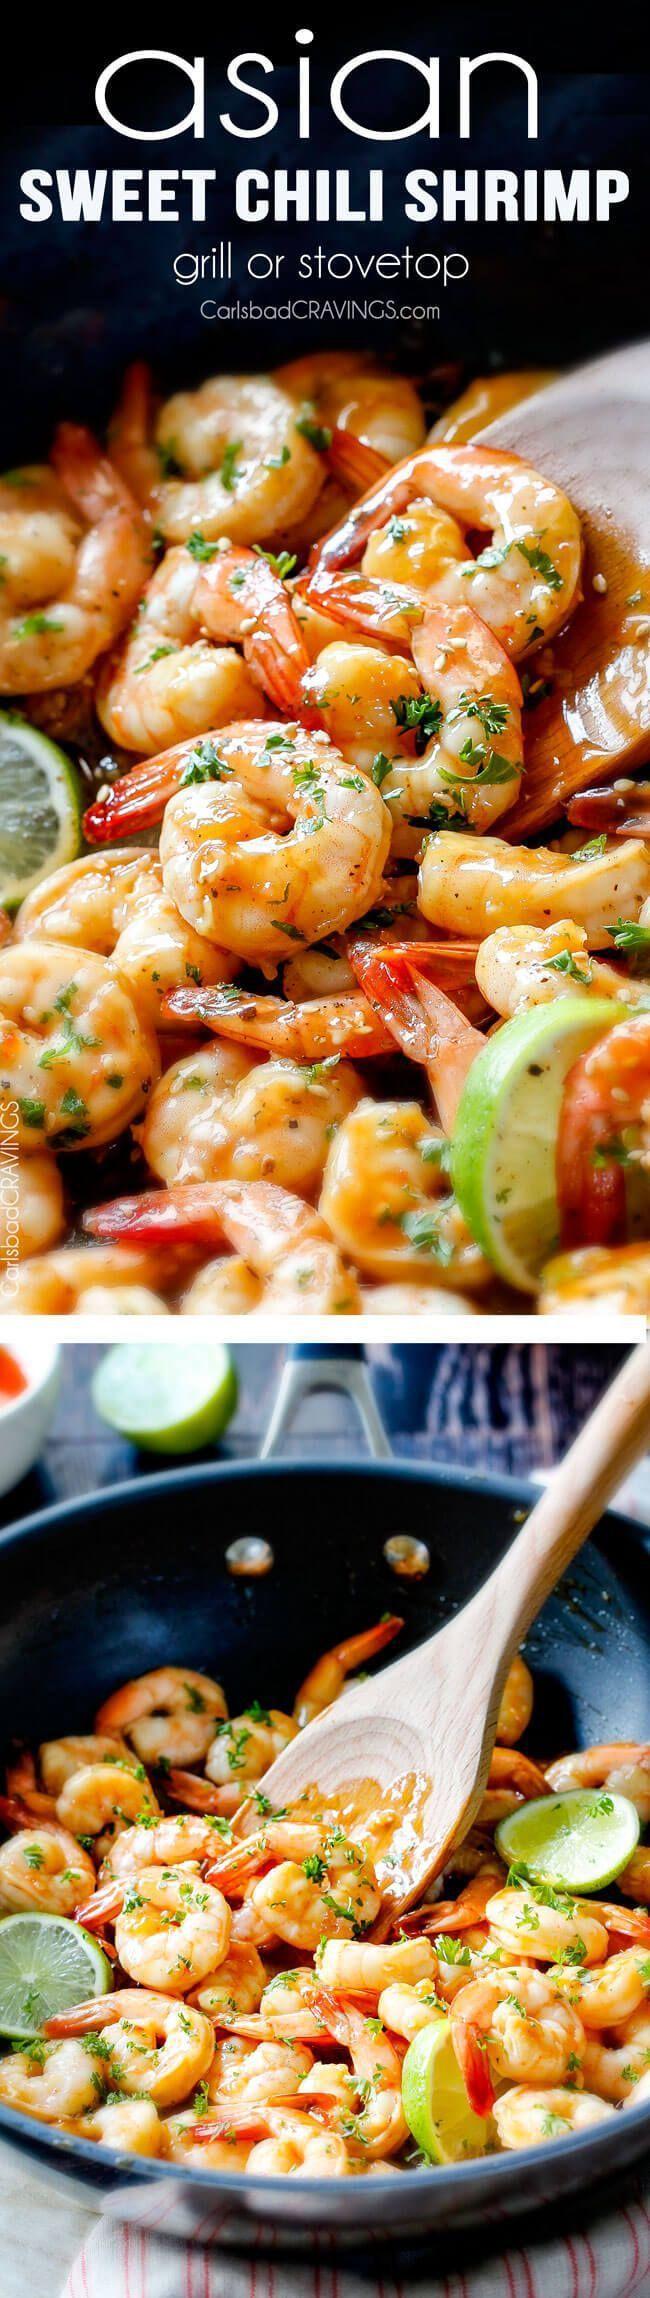 Sweet Chili Shrimp (grill or stovetop)  Carlsbad Cravings